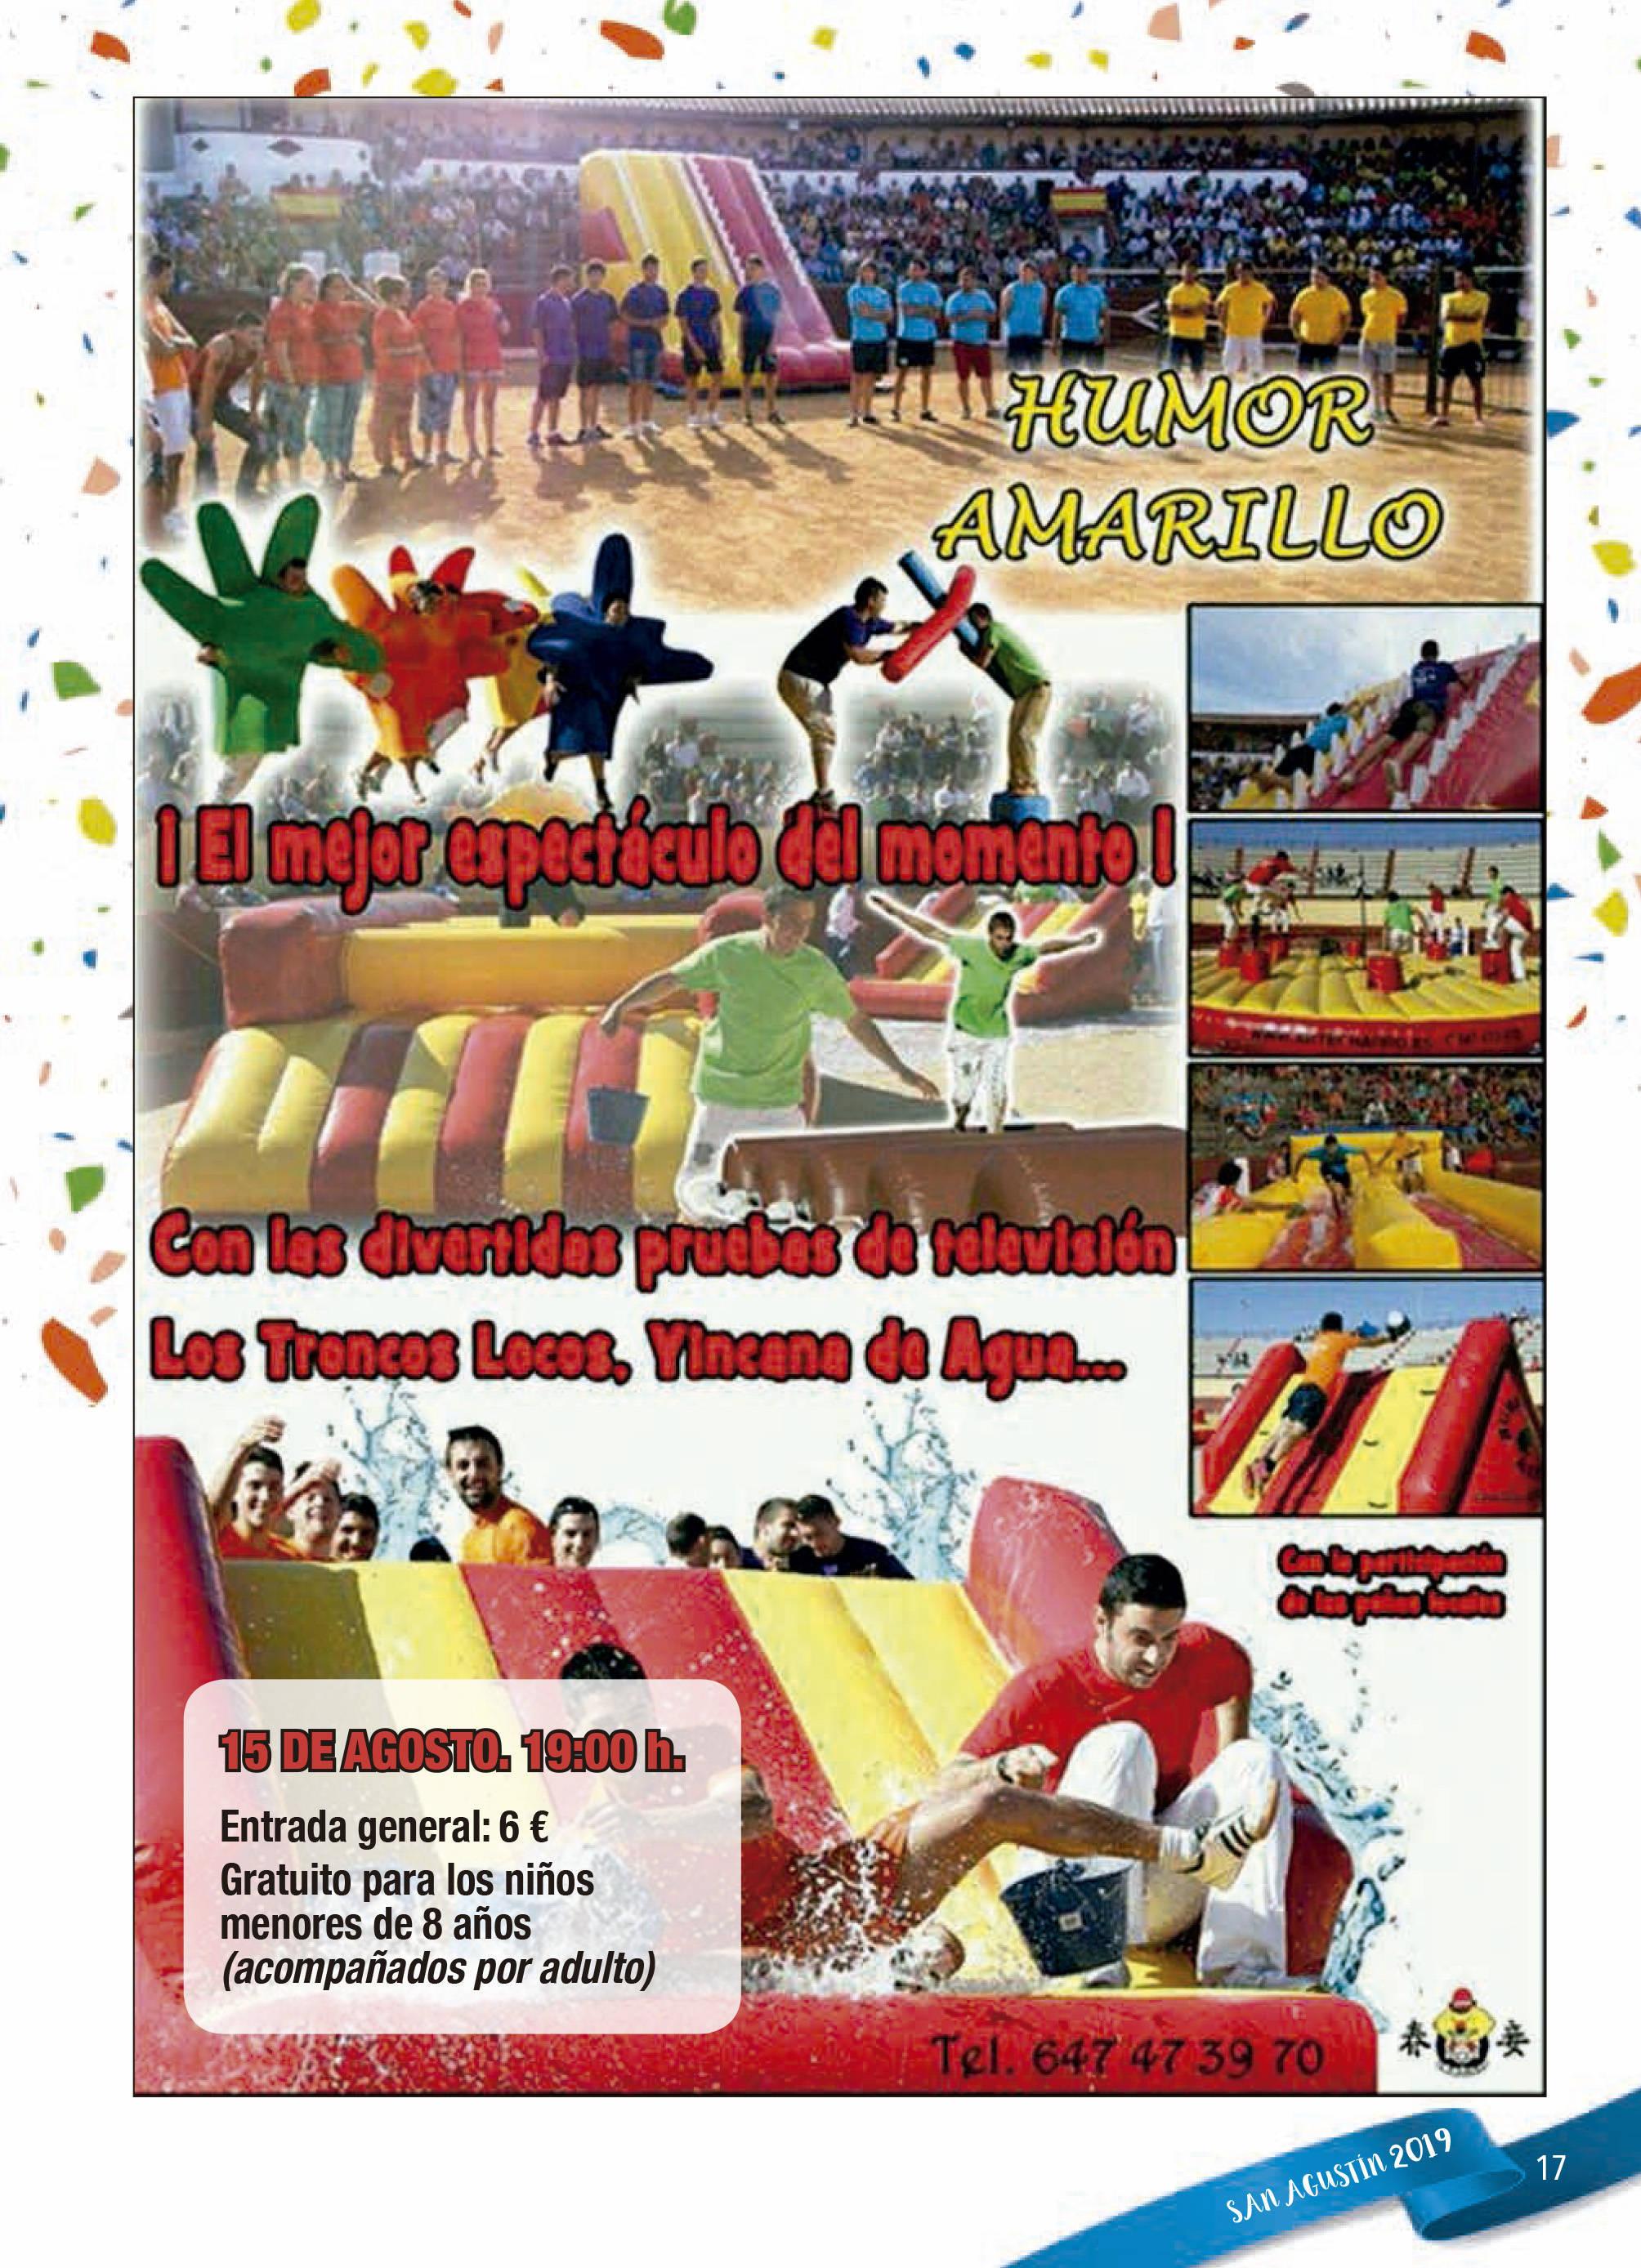 Programa de ferias y fiestas 2019 - Fermoselle (Zamora) 6